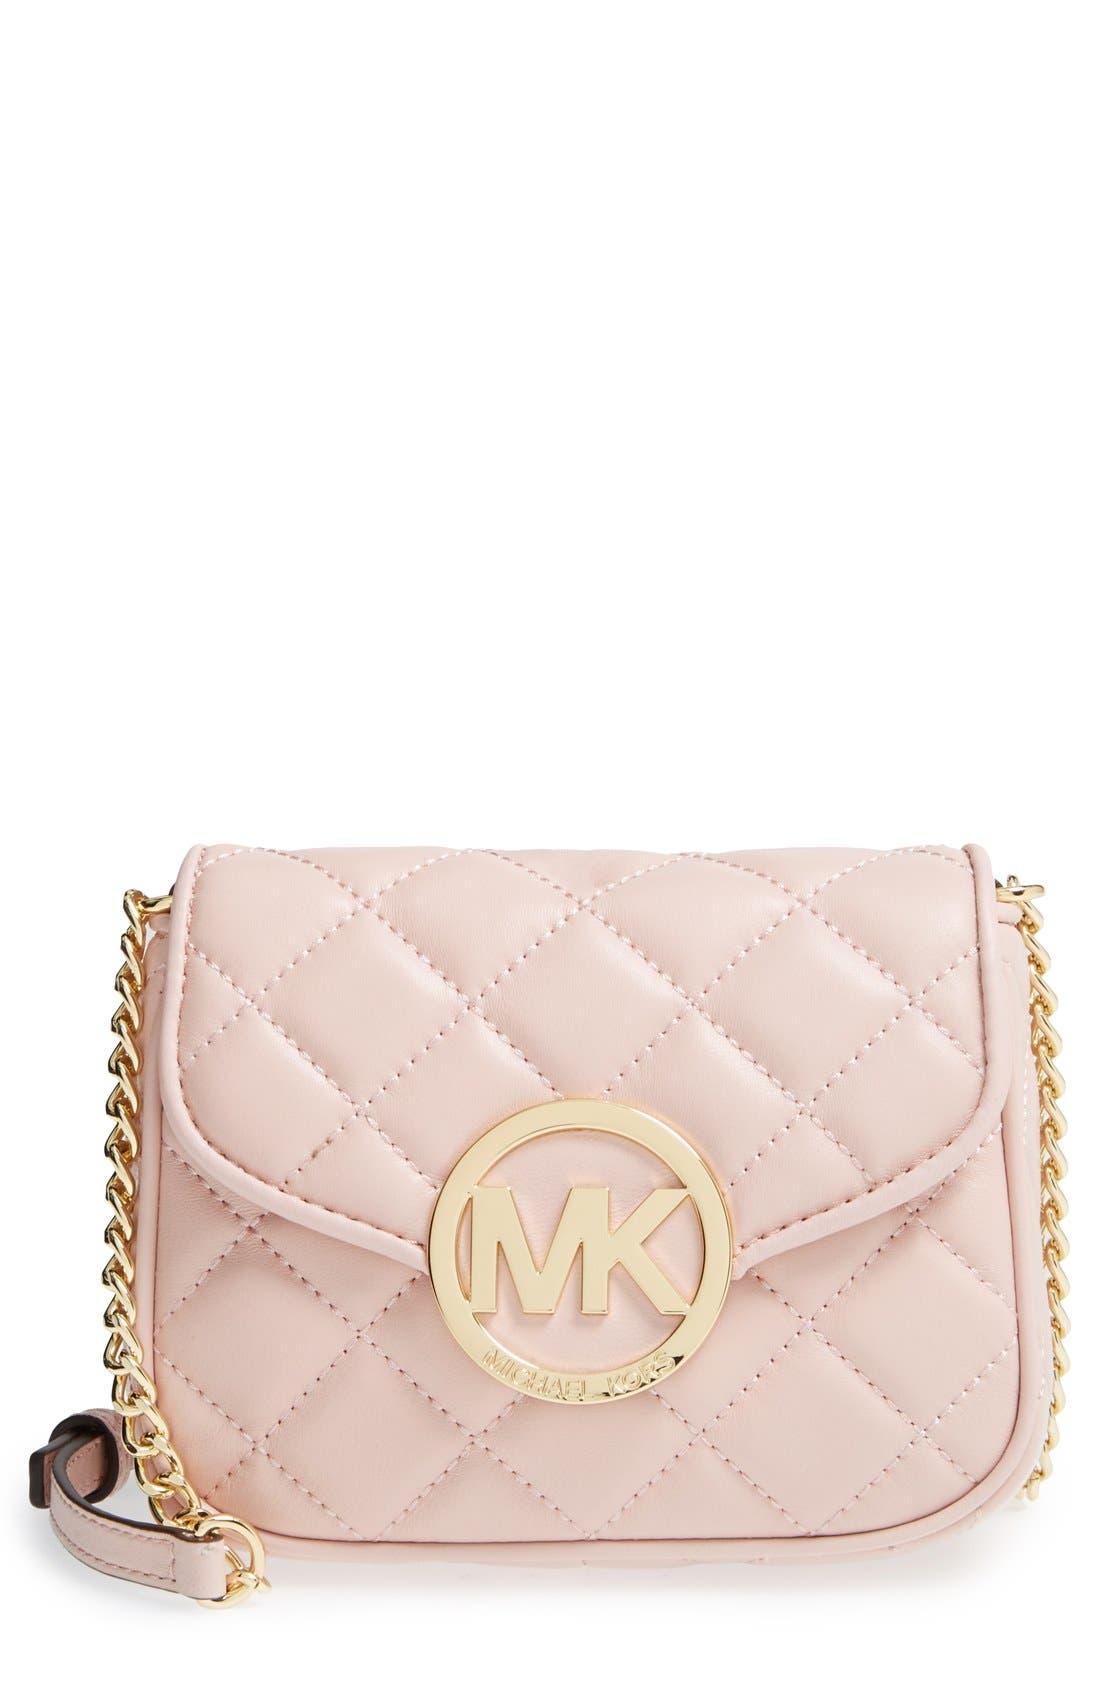 Main Image - MICHAEL Michael Kors 'Small Fulton' Quilted Crossbody Bag